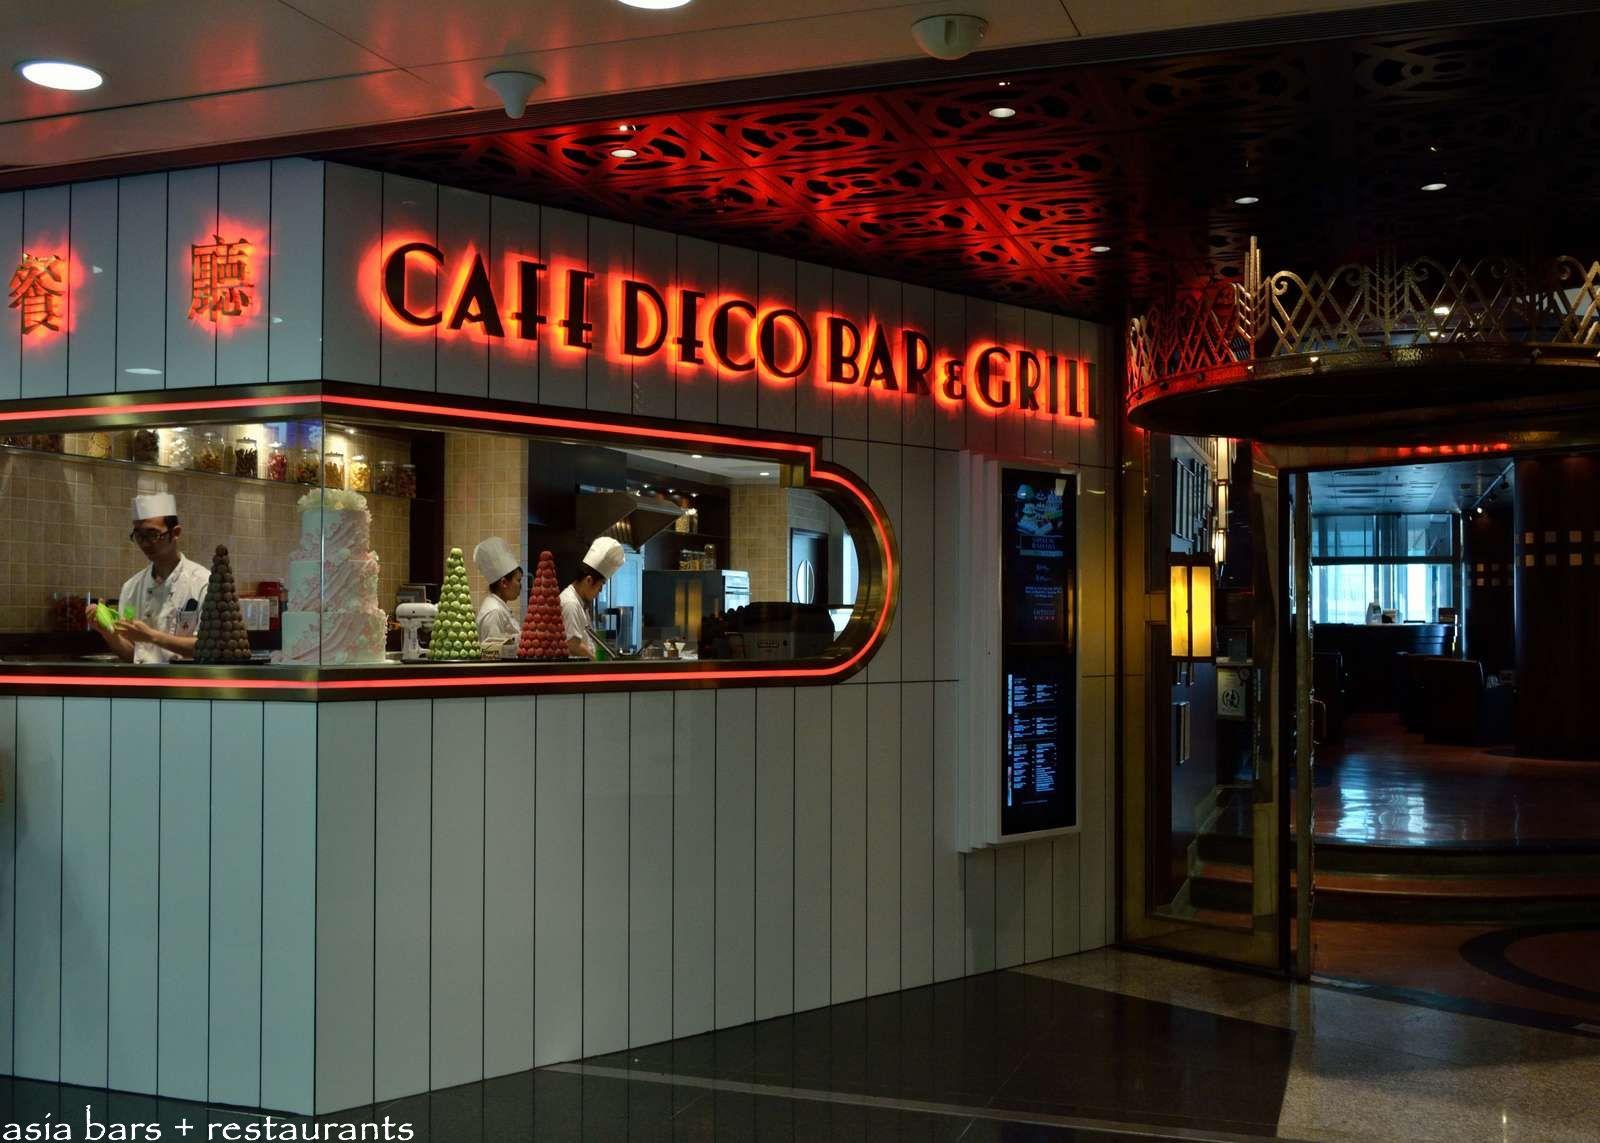 Cafe deco bar & grill at the peak hong kong asia bars & restaurants